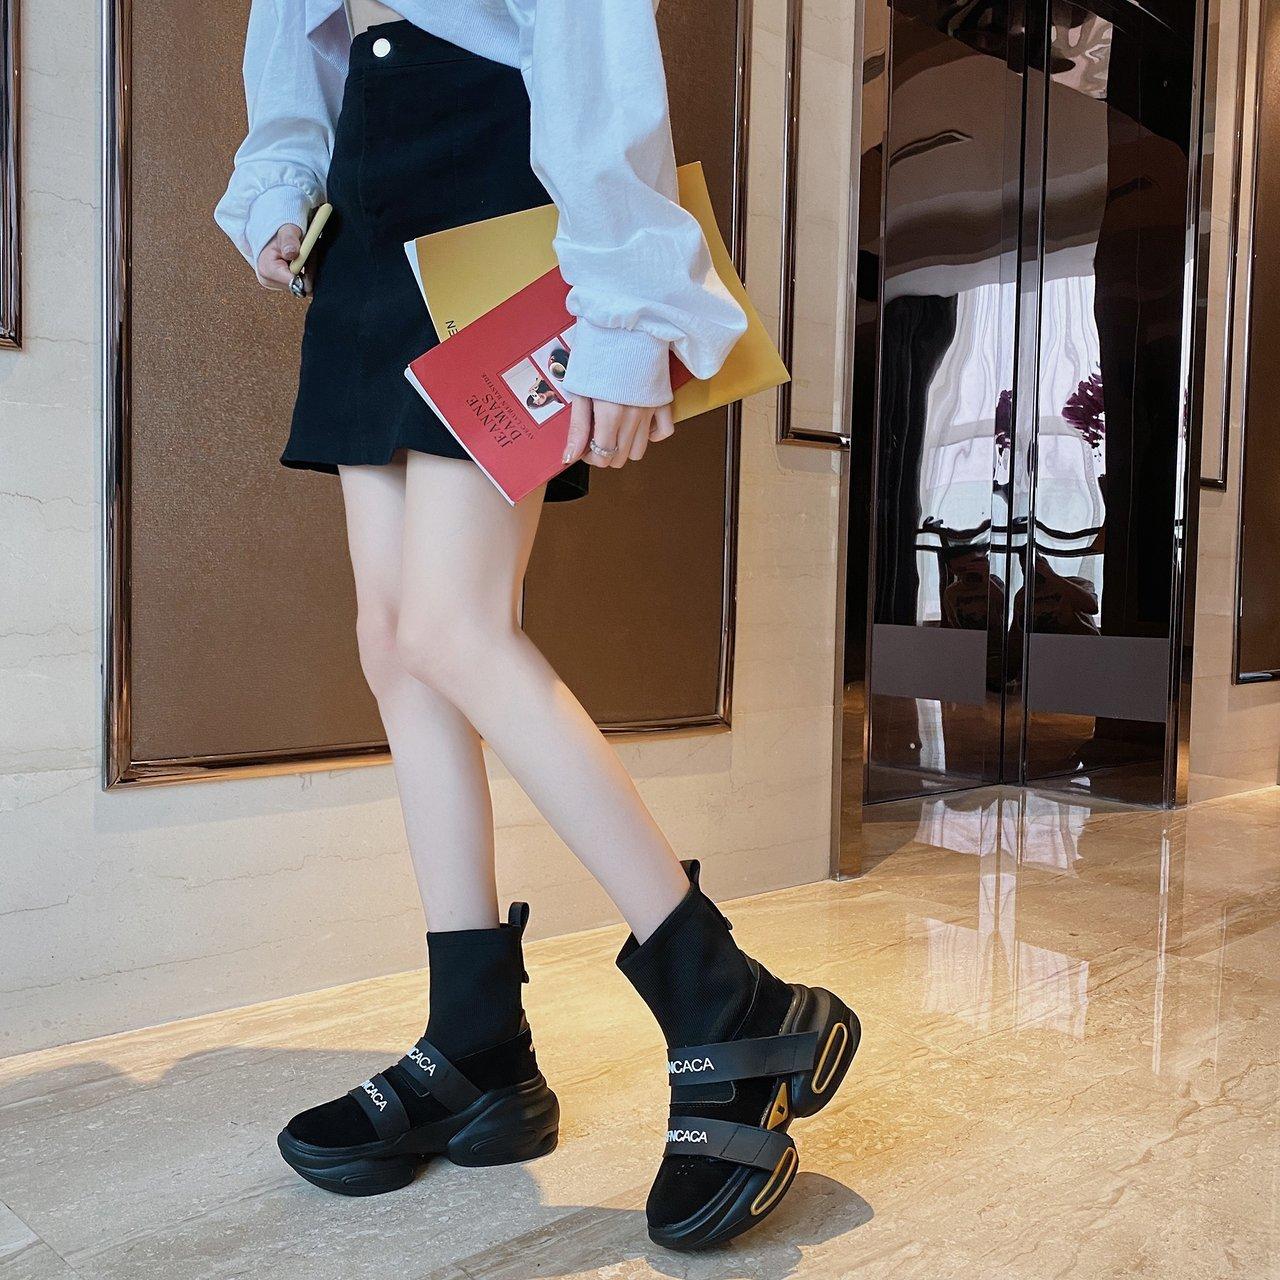 Women Shoes Slip On Women Sneakers 2021 hot Women Vulcanize Shoes Basket Femme Sock Shoes Women Flat